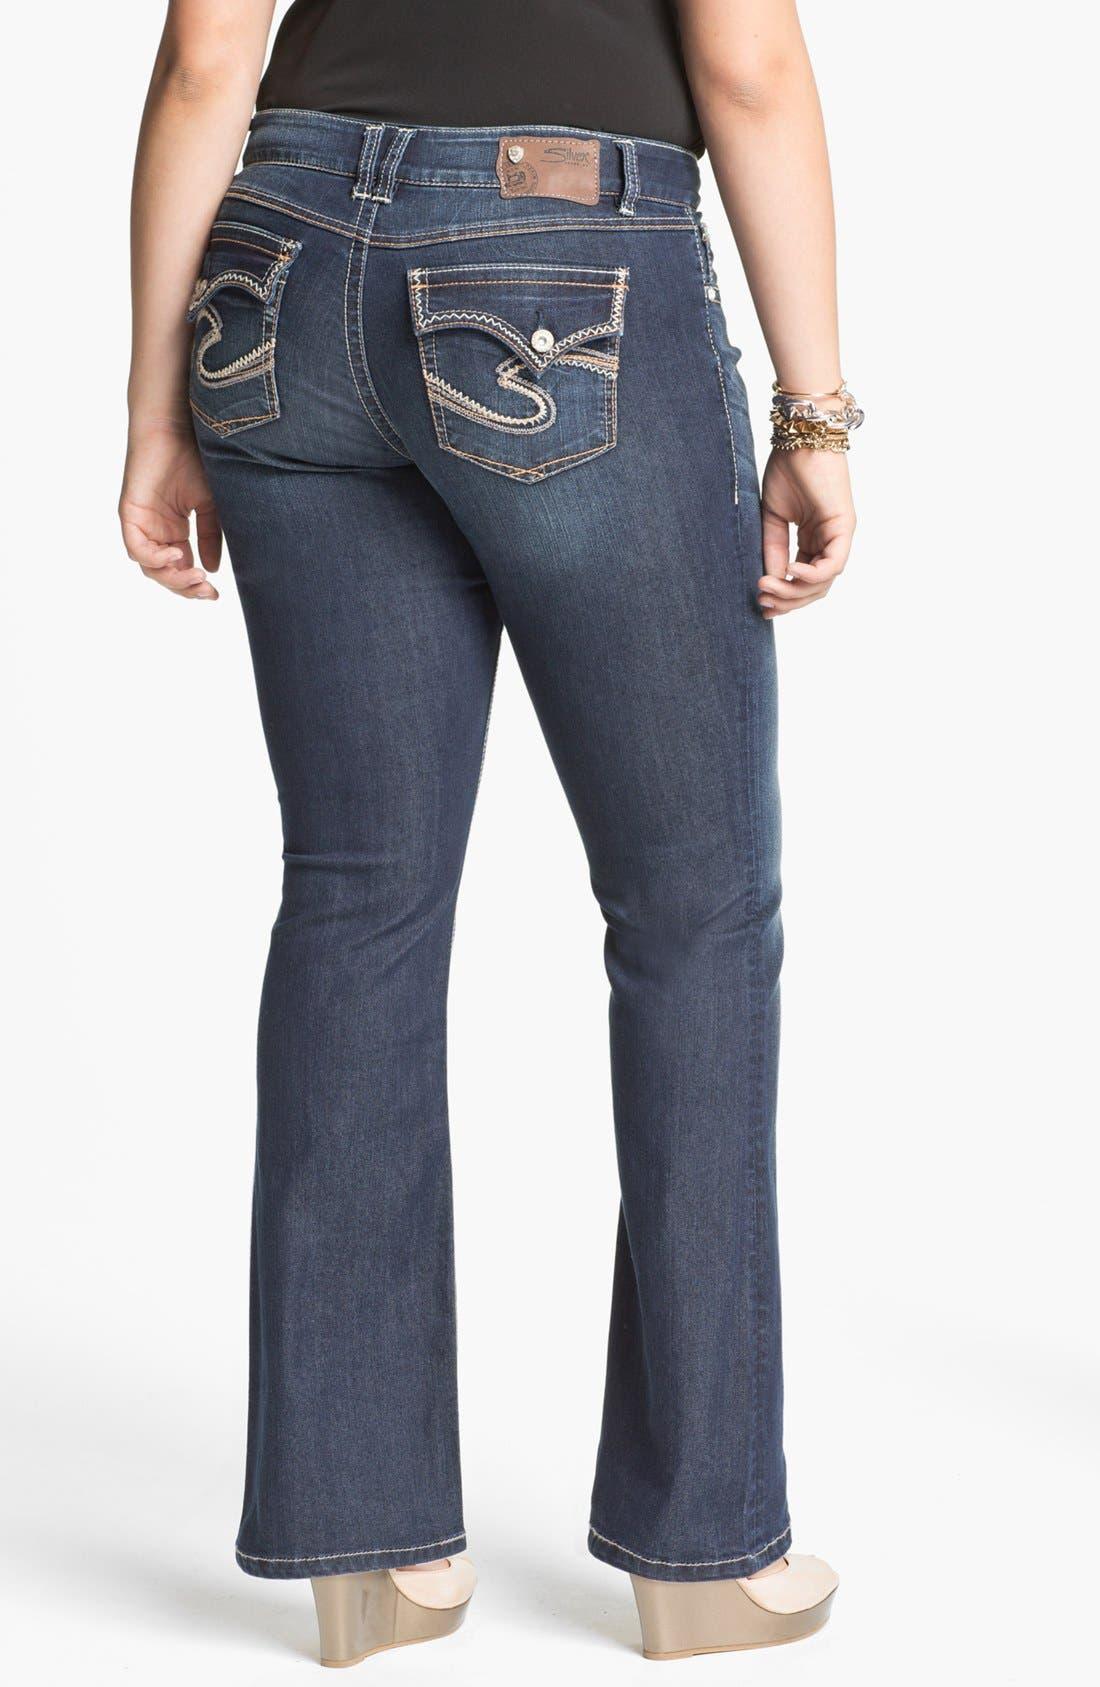 Alternate Image 2  - Silver Jeans Co. 'Dawson' Bootcut Jeans (Juniors Plus)